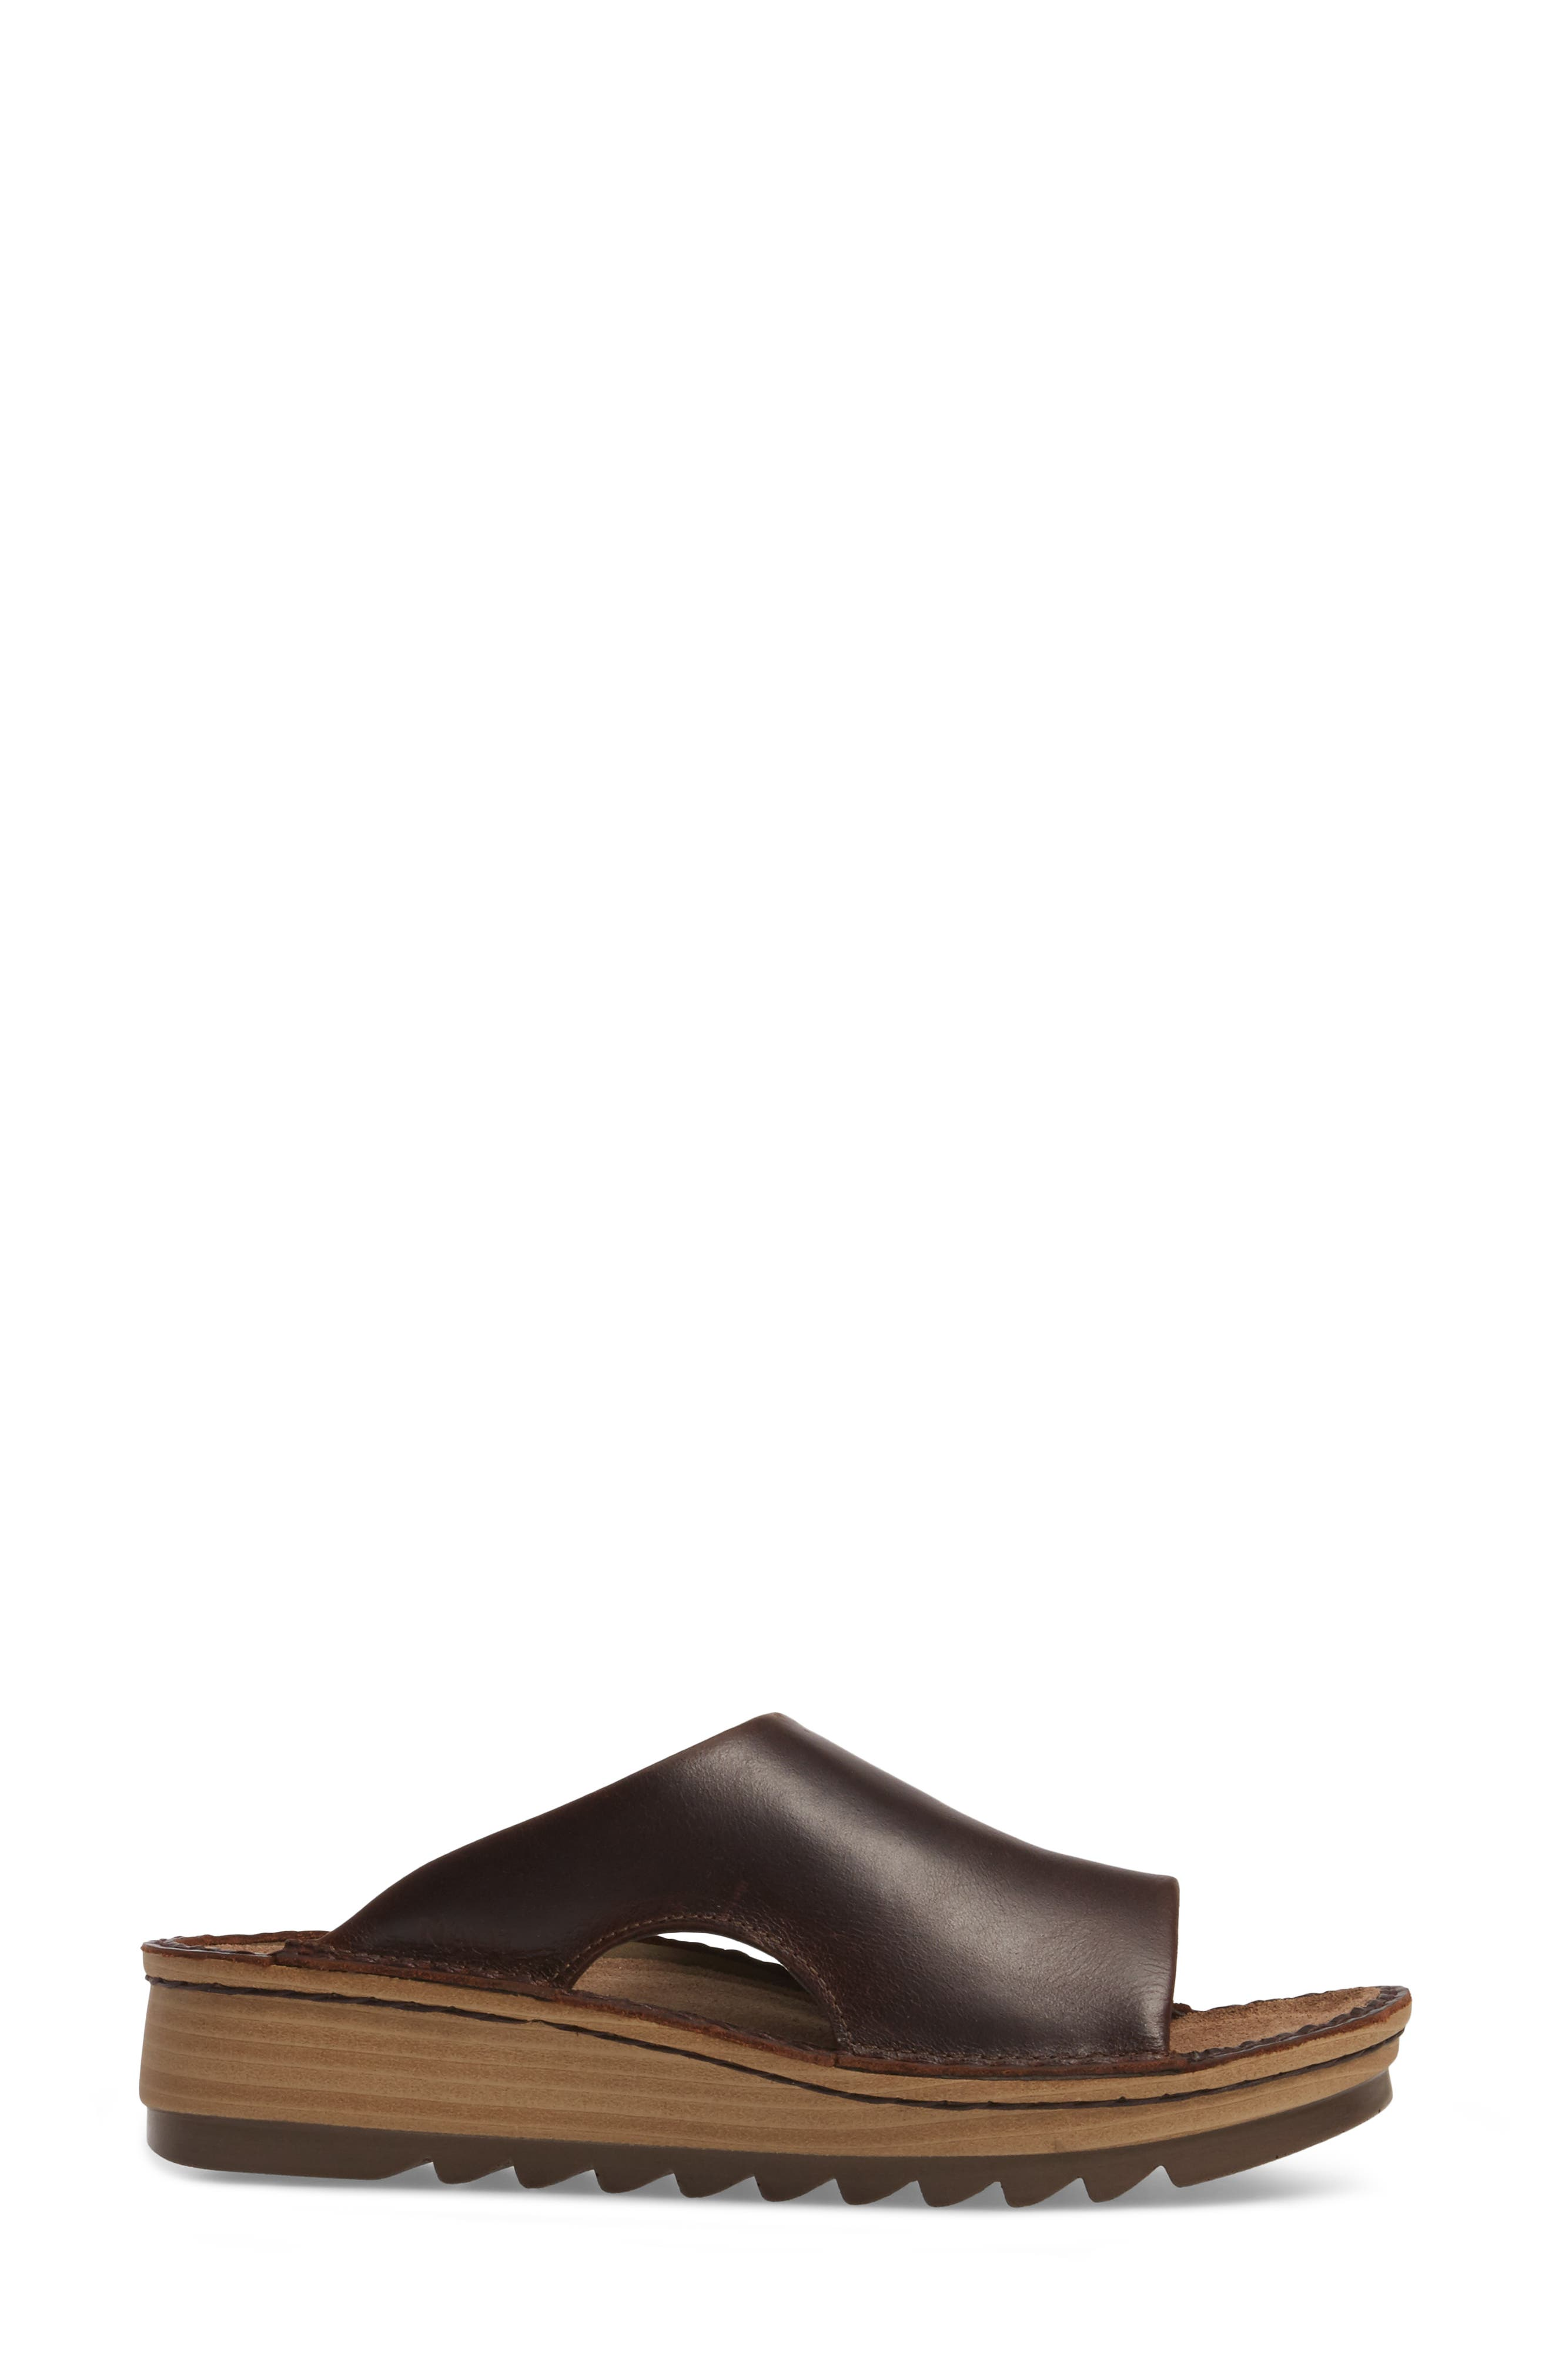 'Ardisia' Slide Sandal,                             Alternate thumbnail 3, color,                             Buffalo Leather